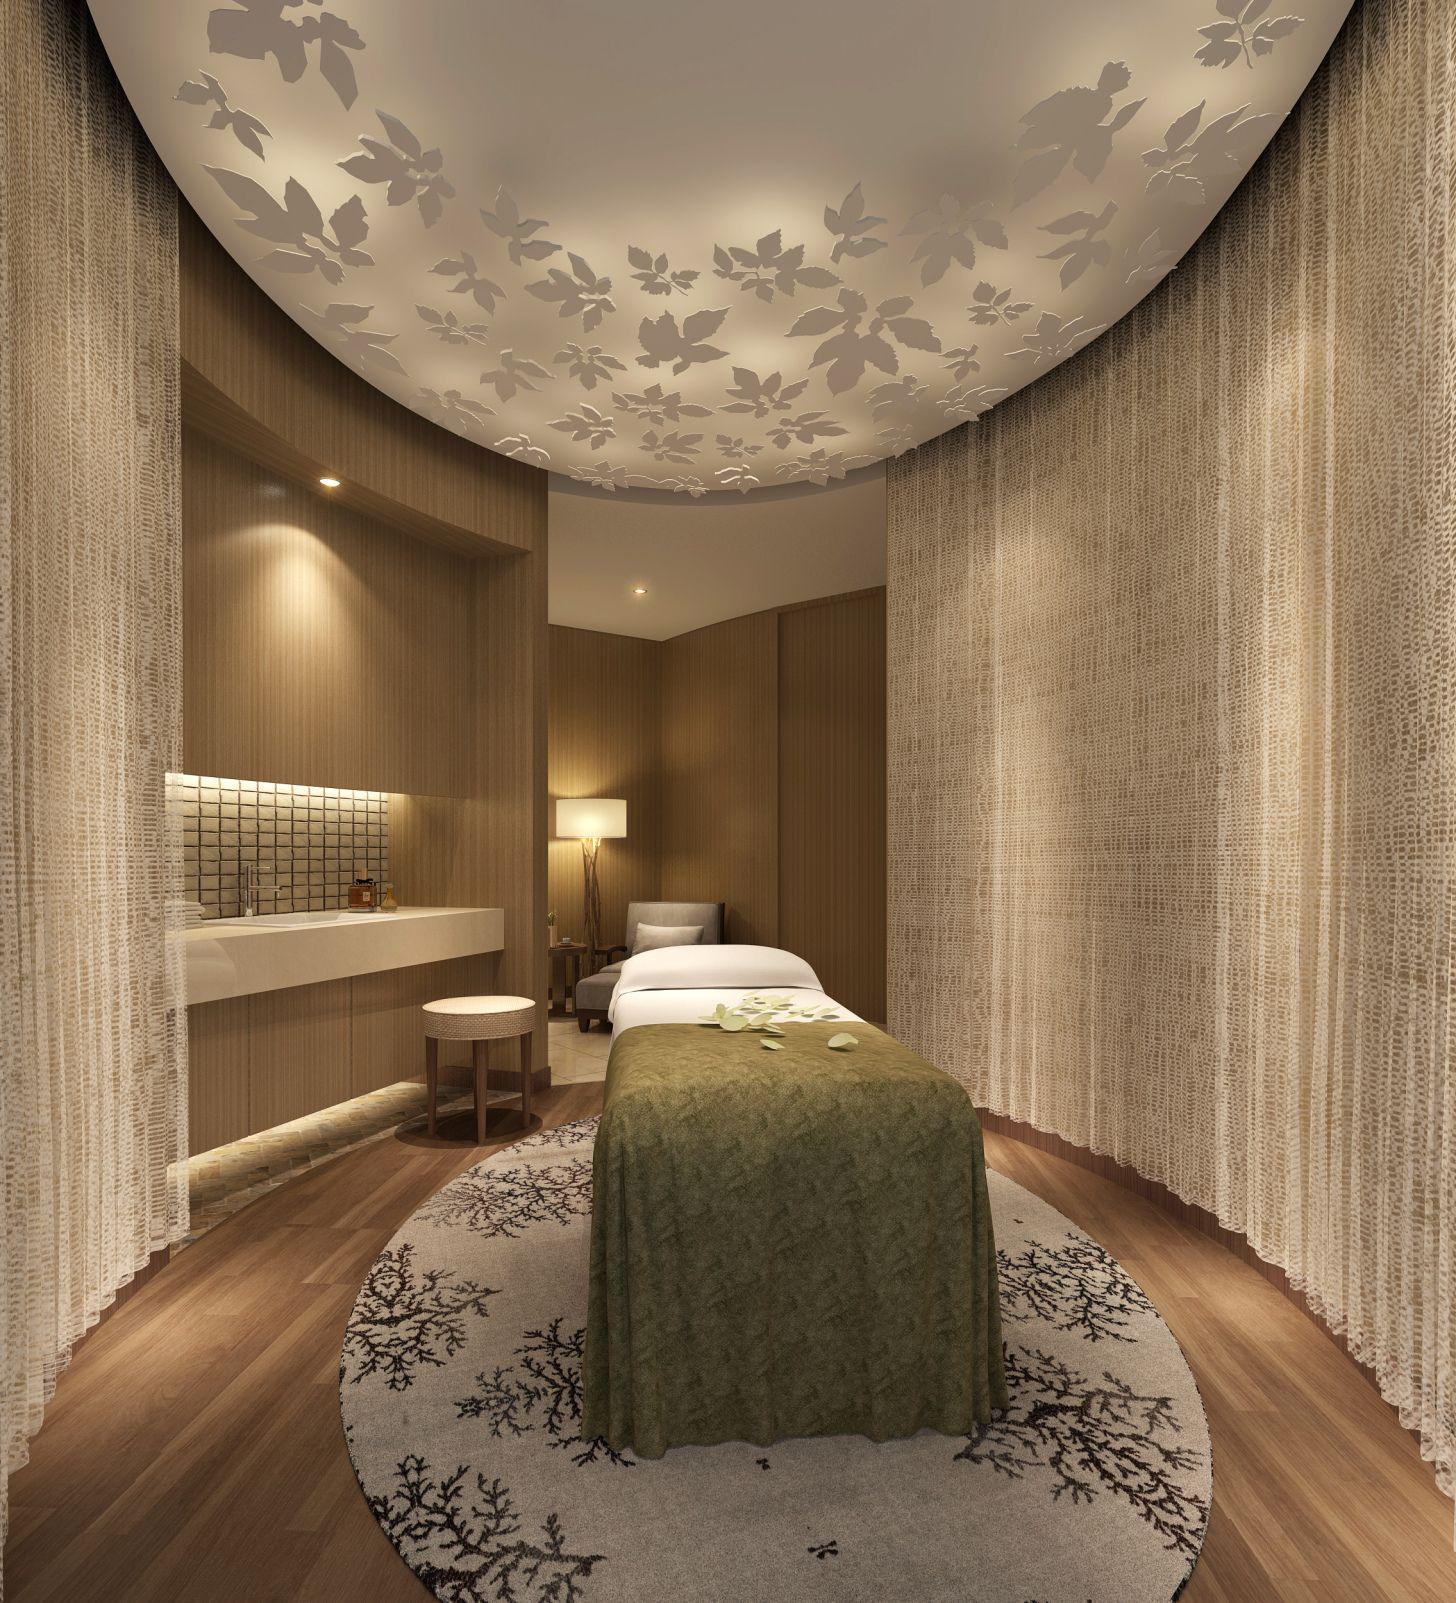 Home Spa Design Ideas: So Spa – Typical Treatment Room